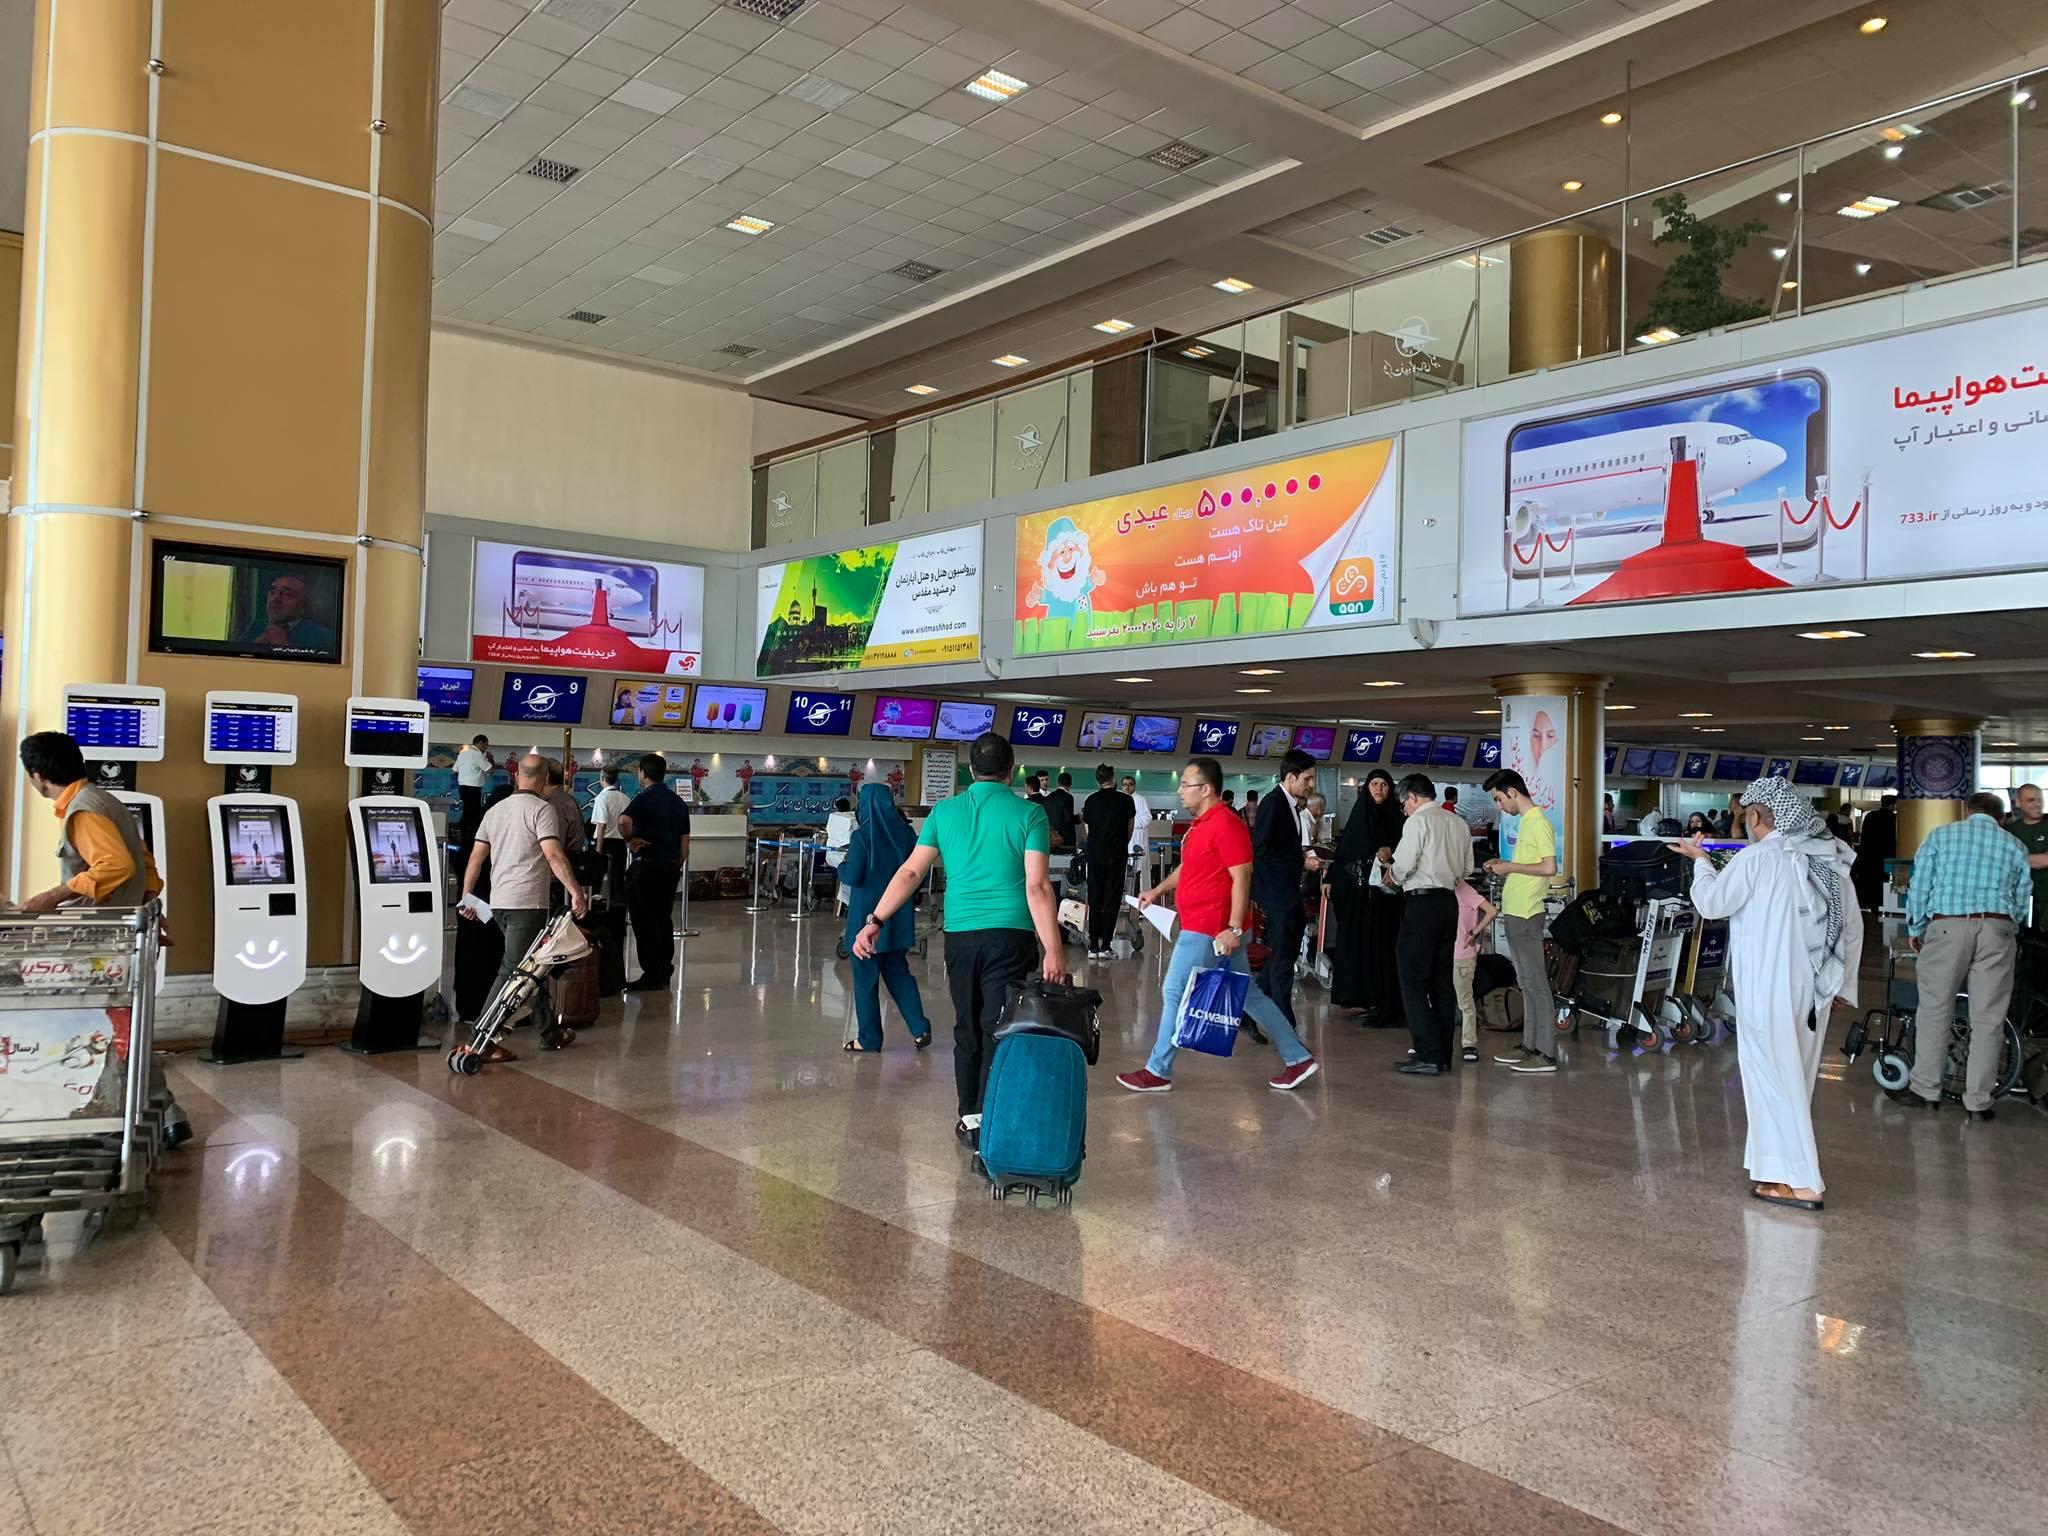 Kach Solo Travels in 2019 Mashhad to Shiraz1.jpg